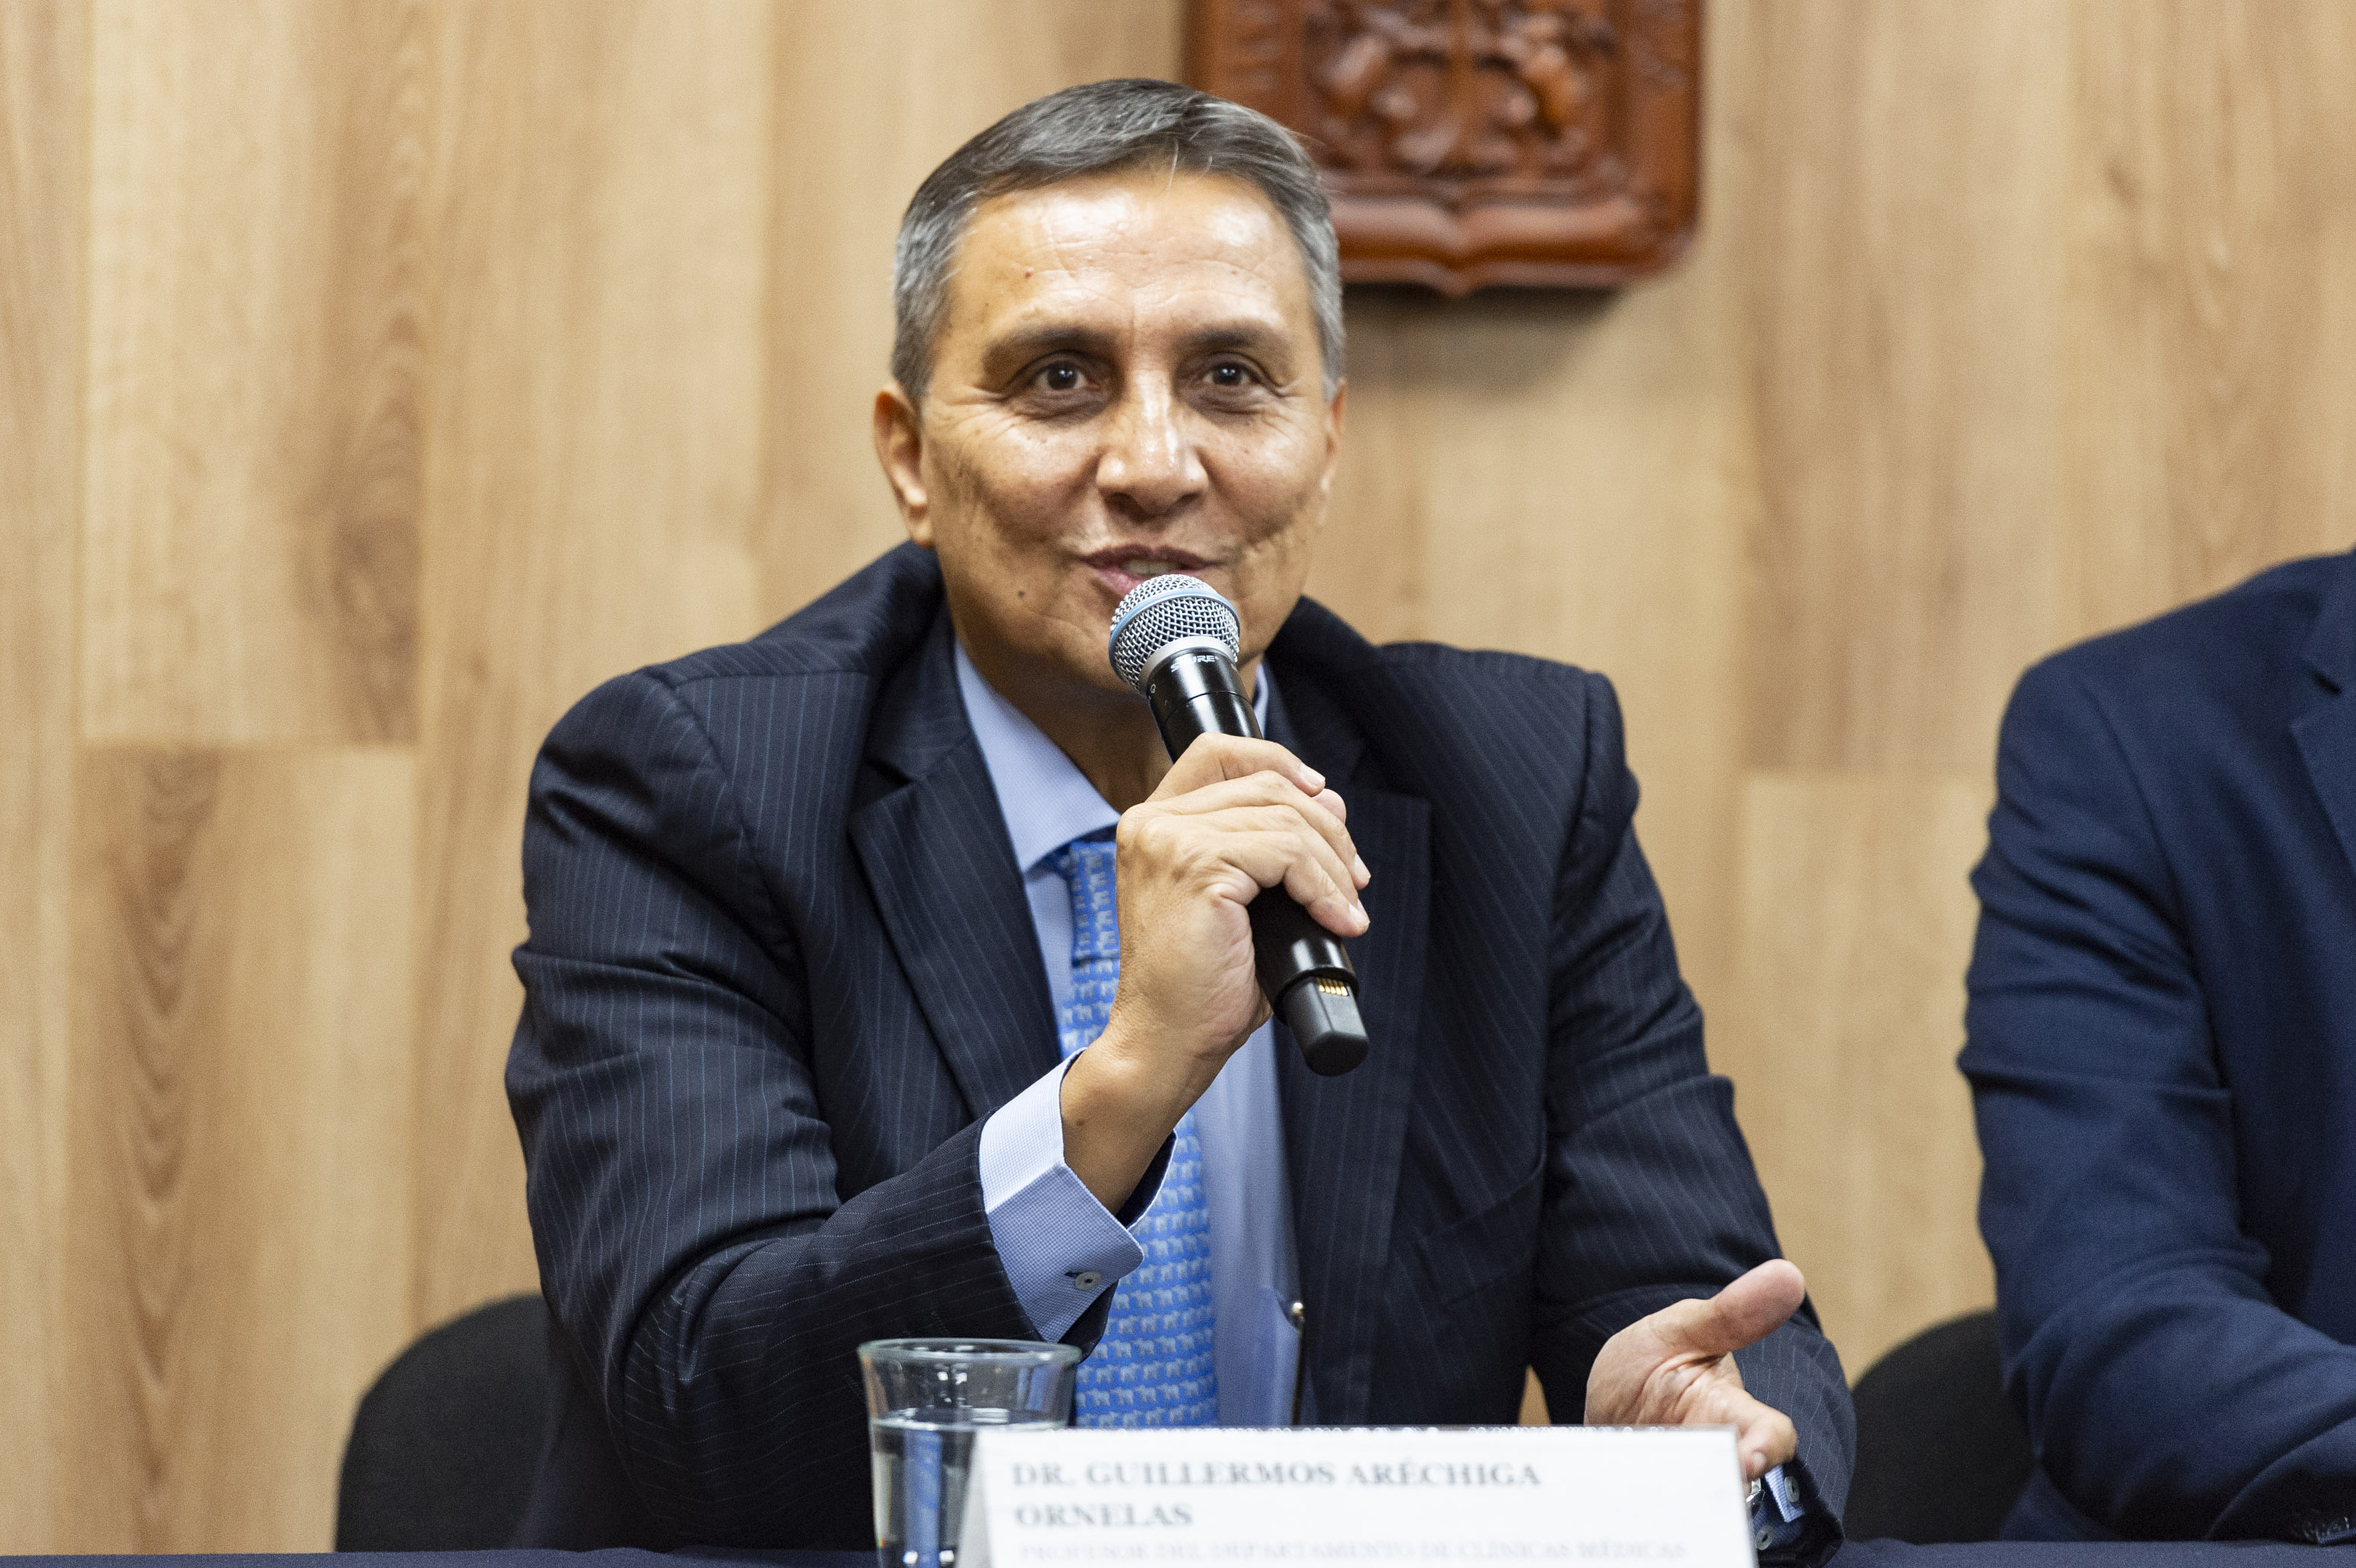 Dr. Guillermo Aréchiga al micrófono